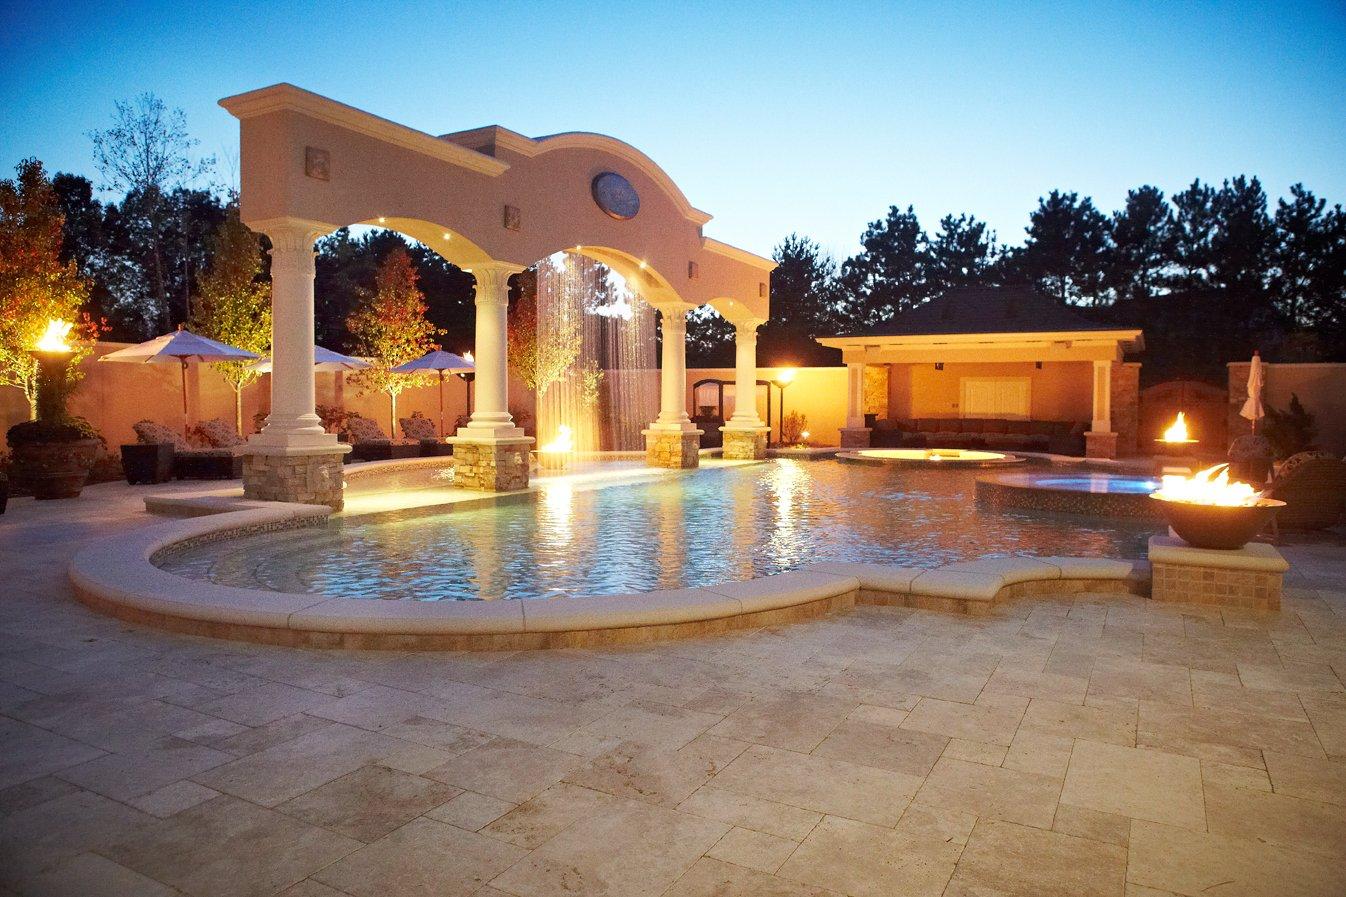 Cascade Luxury Custom Home and Backyard Resort - Signature ... on Luxury Backyard Design  id=52654